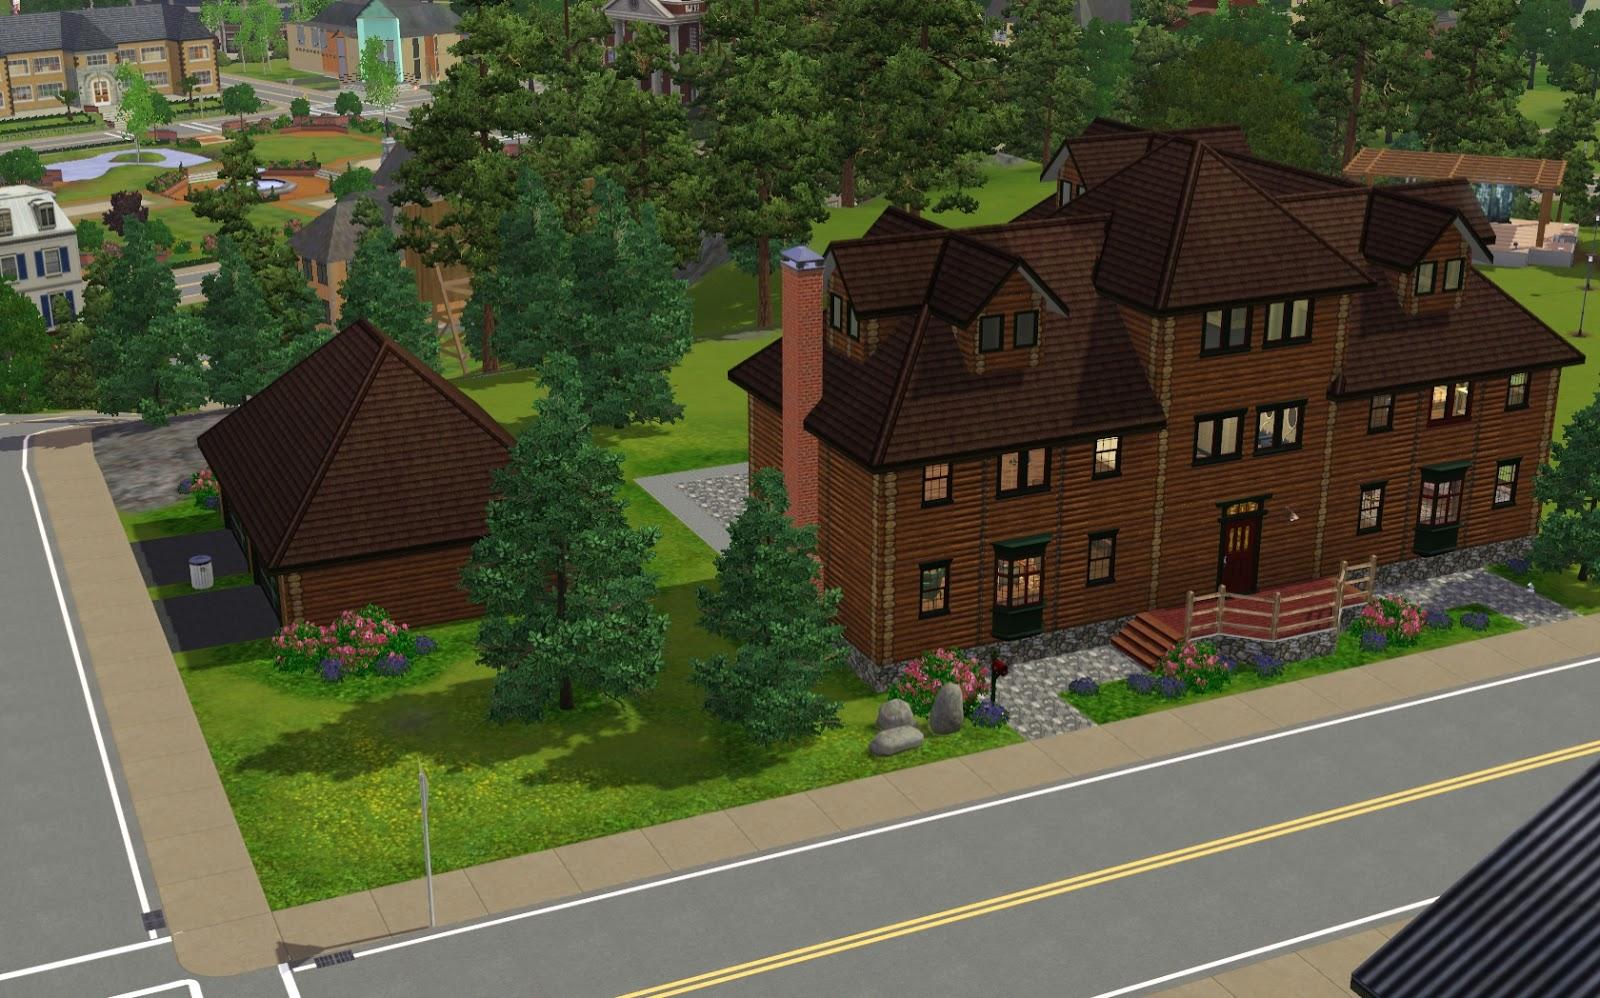 Summer S Little Sims 3 Garden Sunset Valley The Sims 3